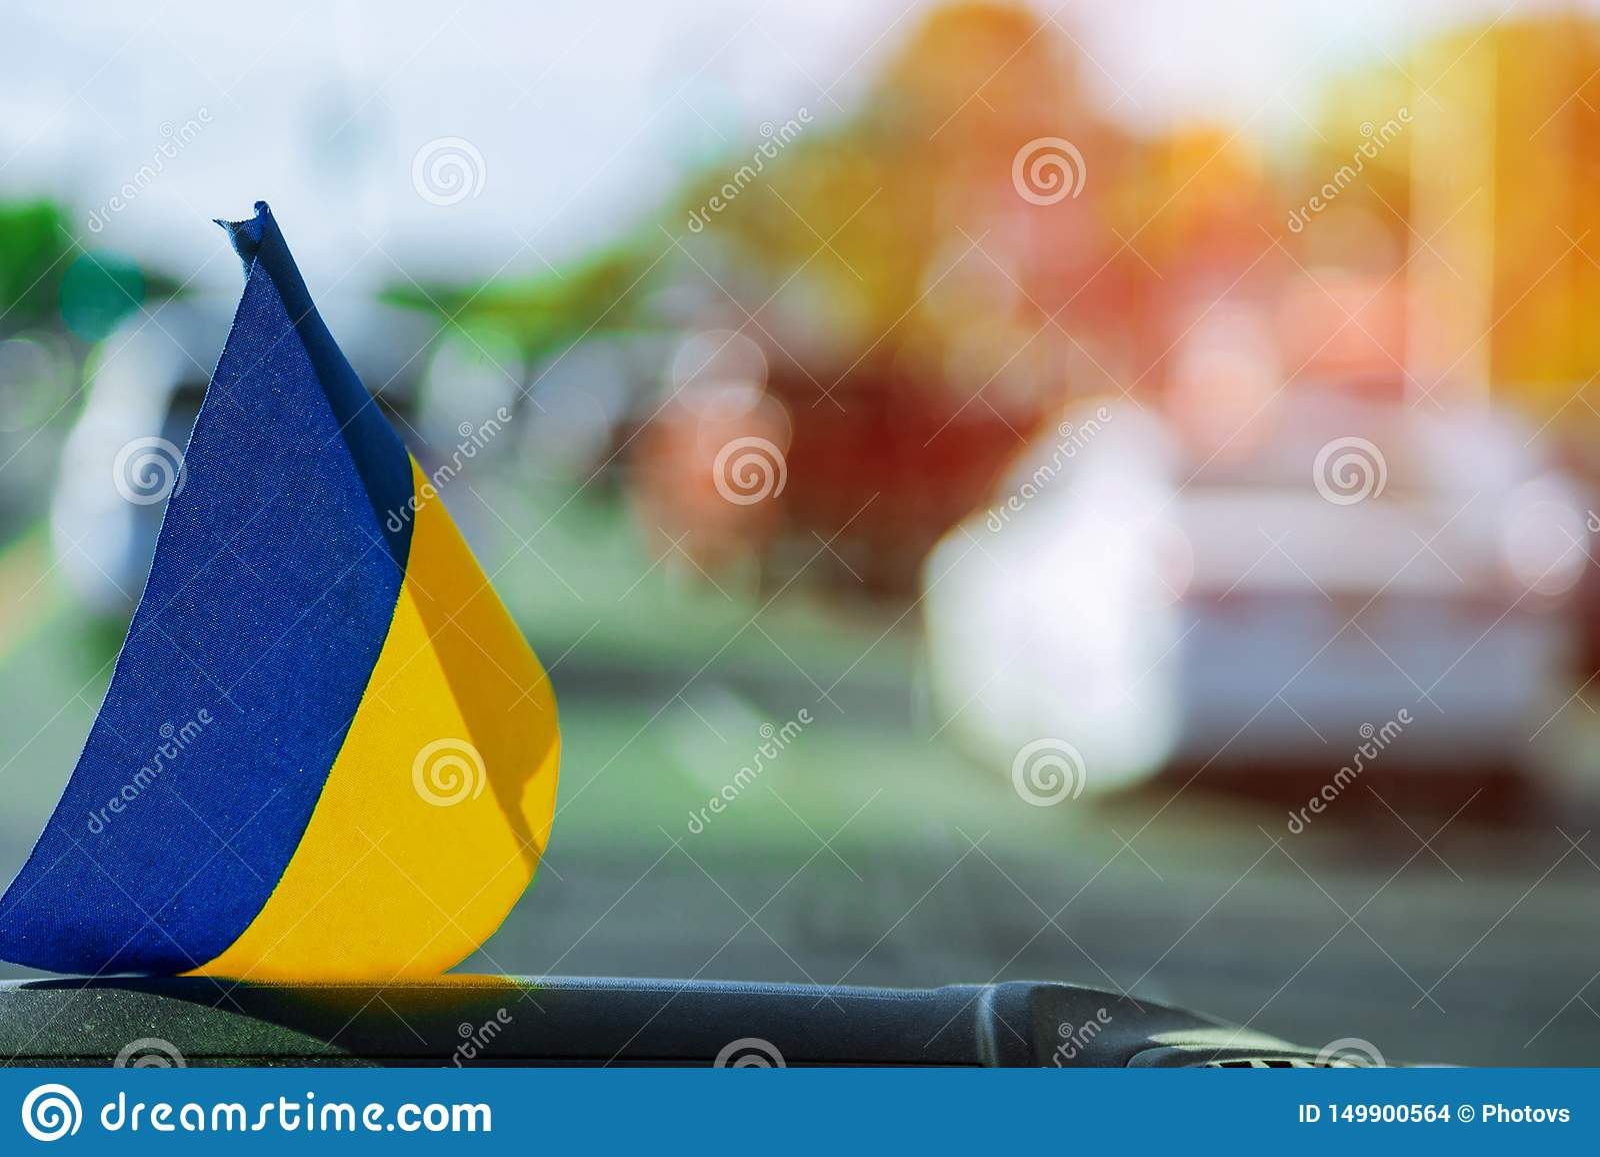 Ukrainian flag on glass inside the car